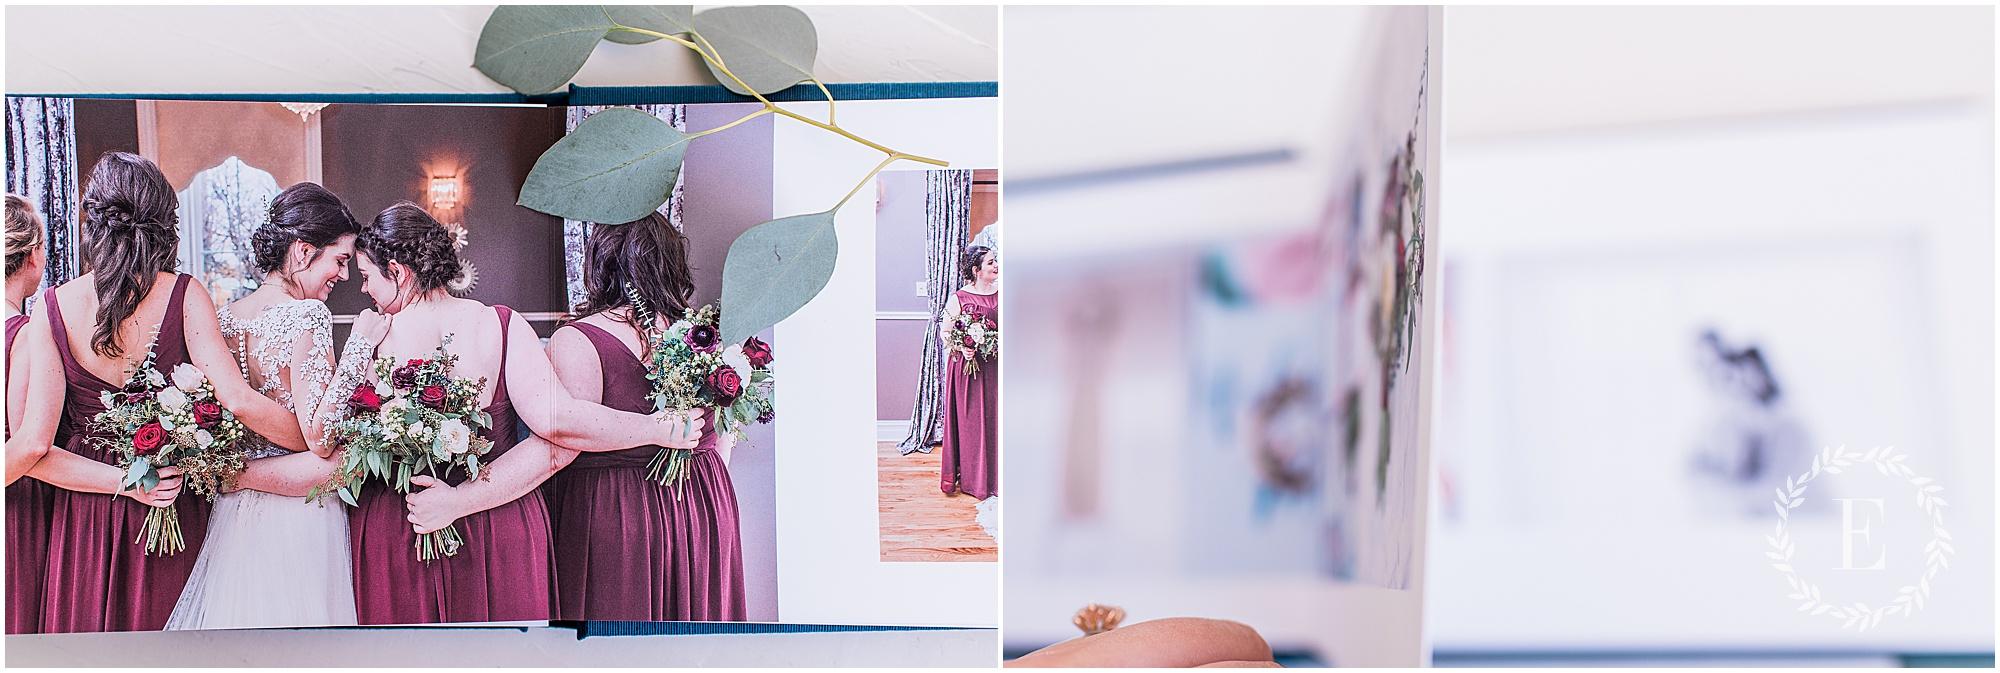 0006 Ottawa Wedding Album - Photography by Emma.jpg